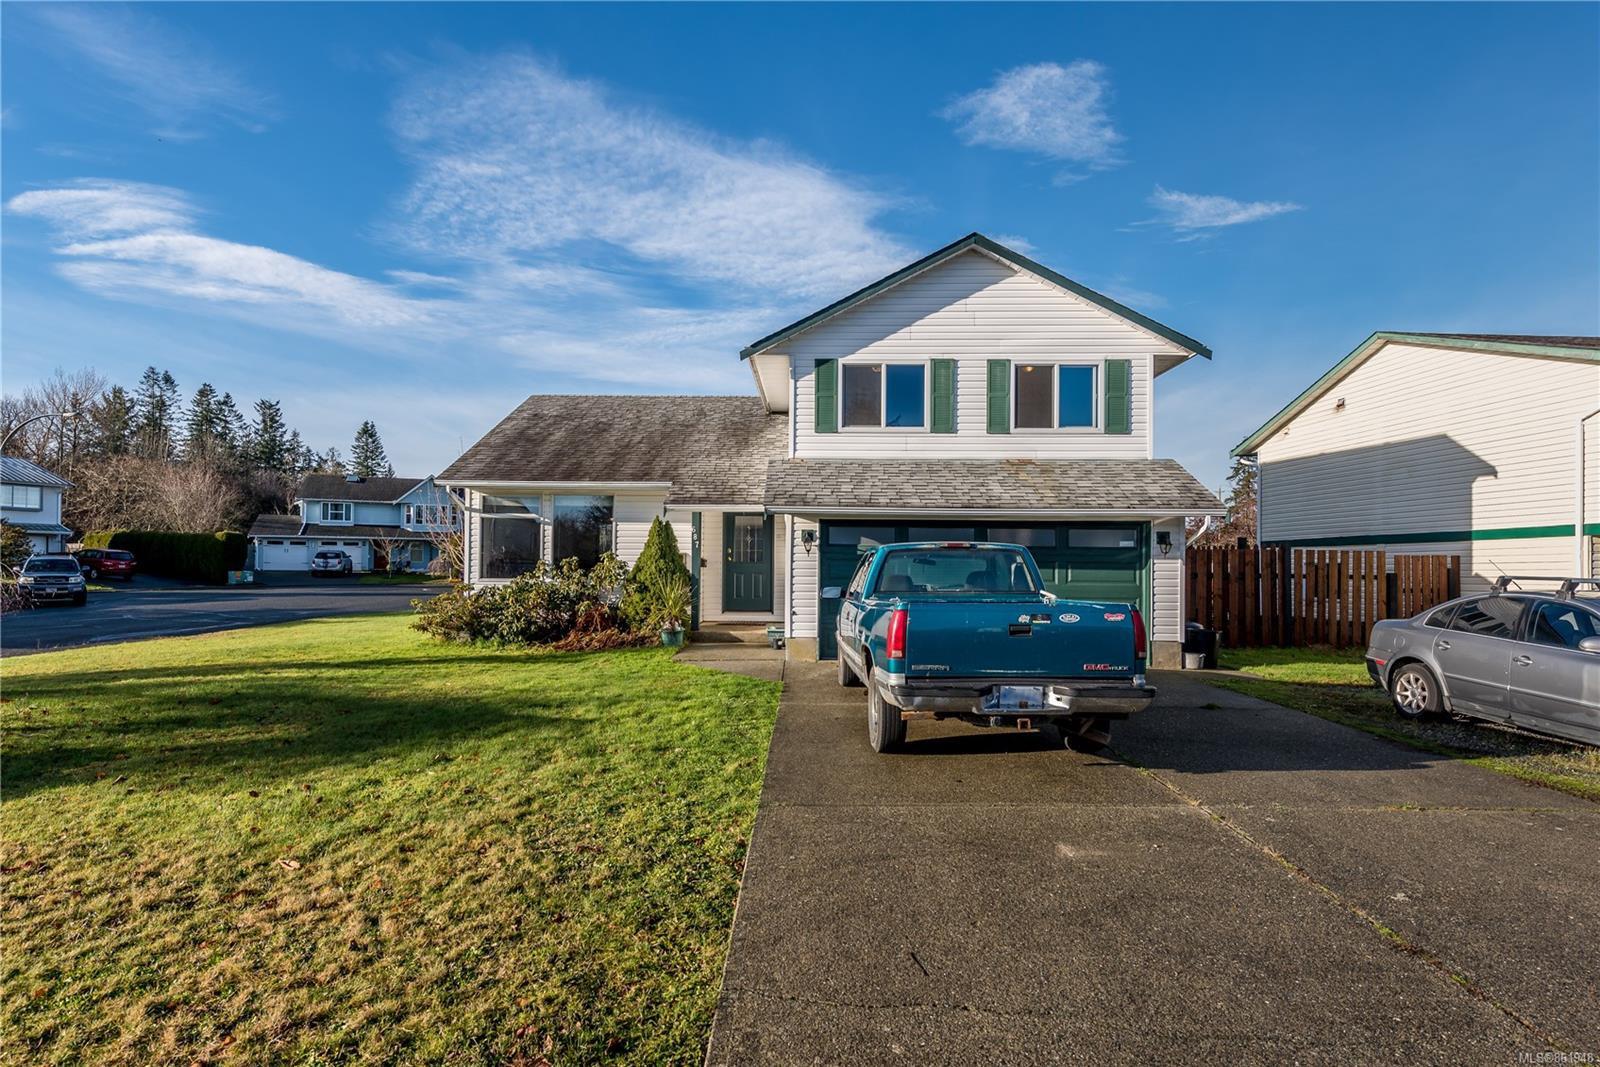 Main Photo: 687 Nootka St in : CV Comox (Town of) House for sale (Comox Valley)  : MLS®# 861948